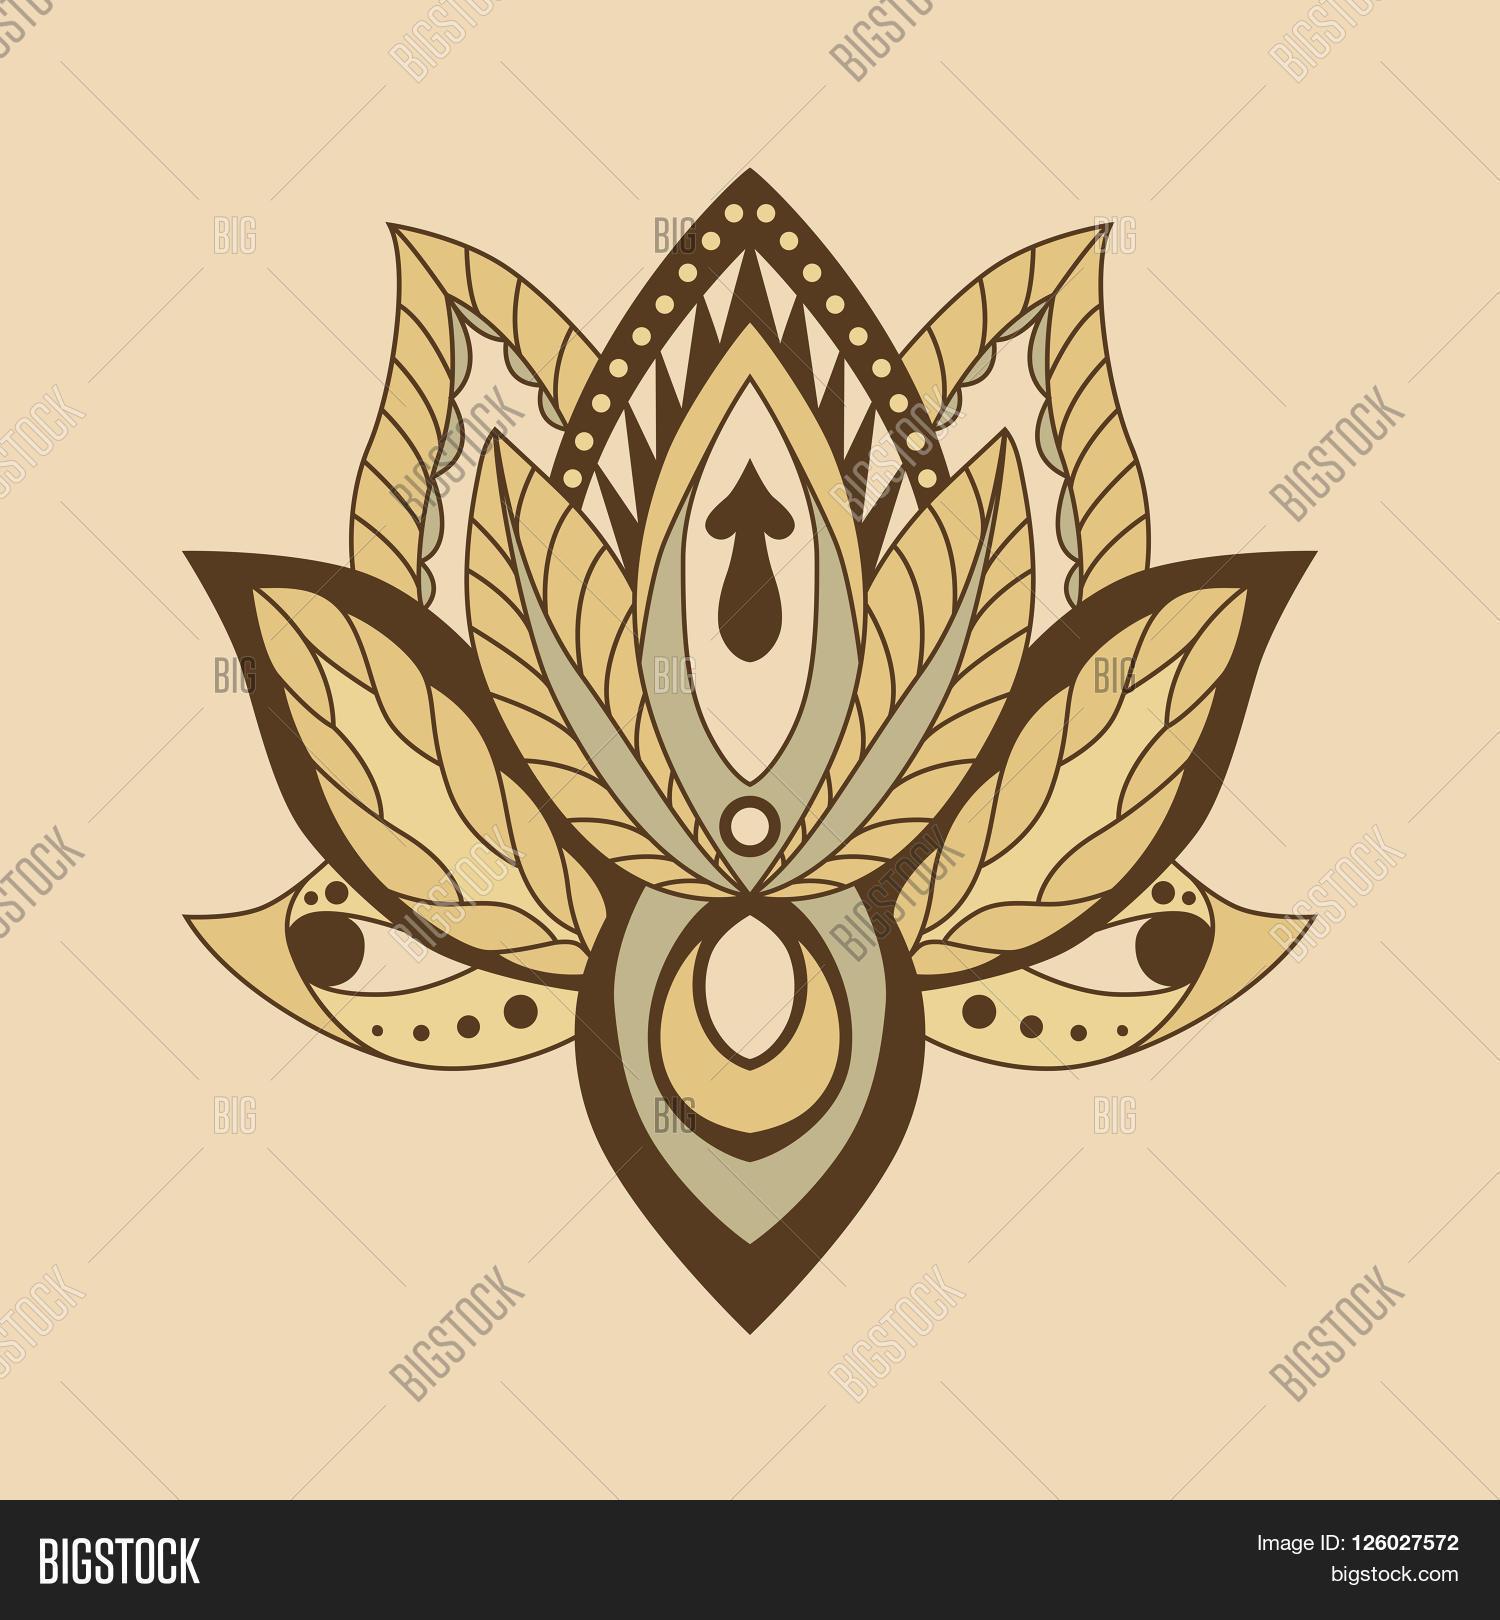 Lotus mandala vector vector photo free trial bigstock lotus mandala vector ornamental lotus ethnic zentang ornamental boho style lotus flower indian mightylinksfo